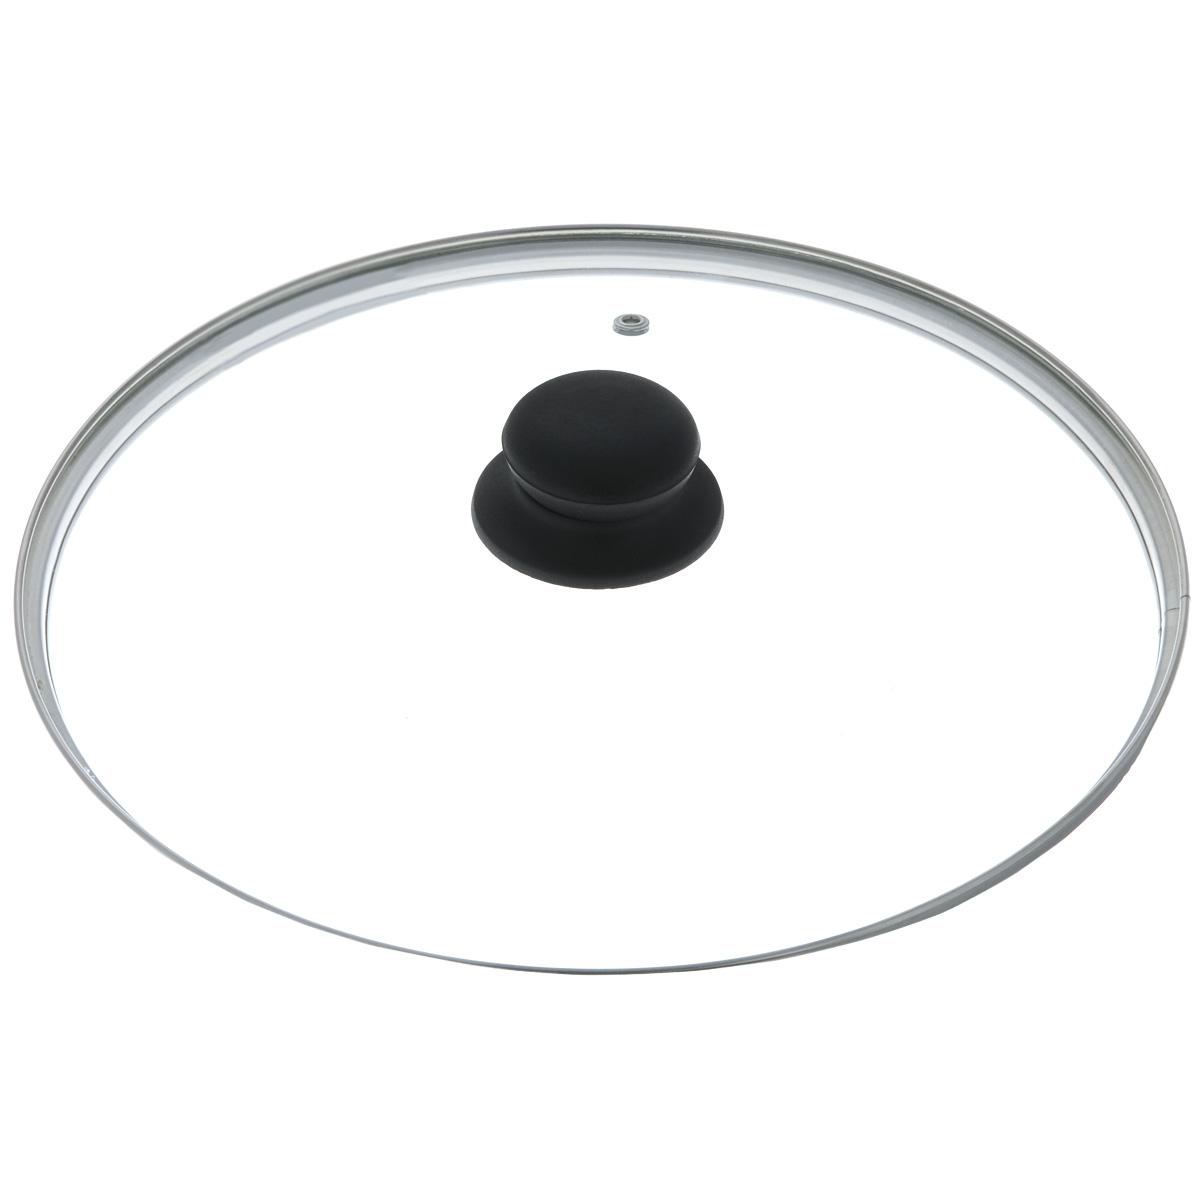 Крышка стеклянная, диаметр 28 см